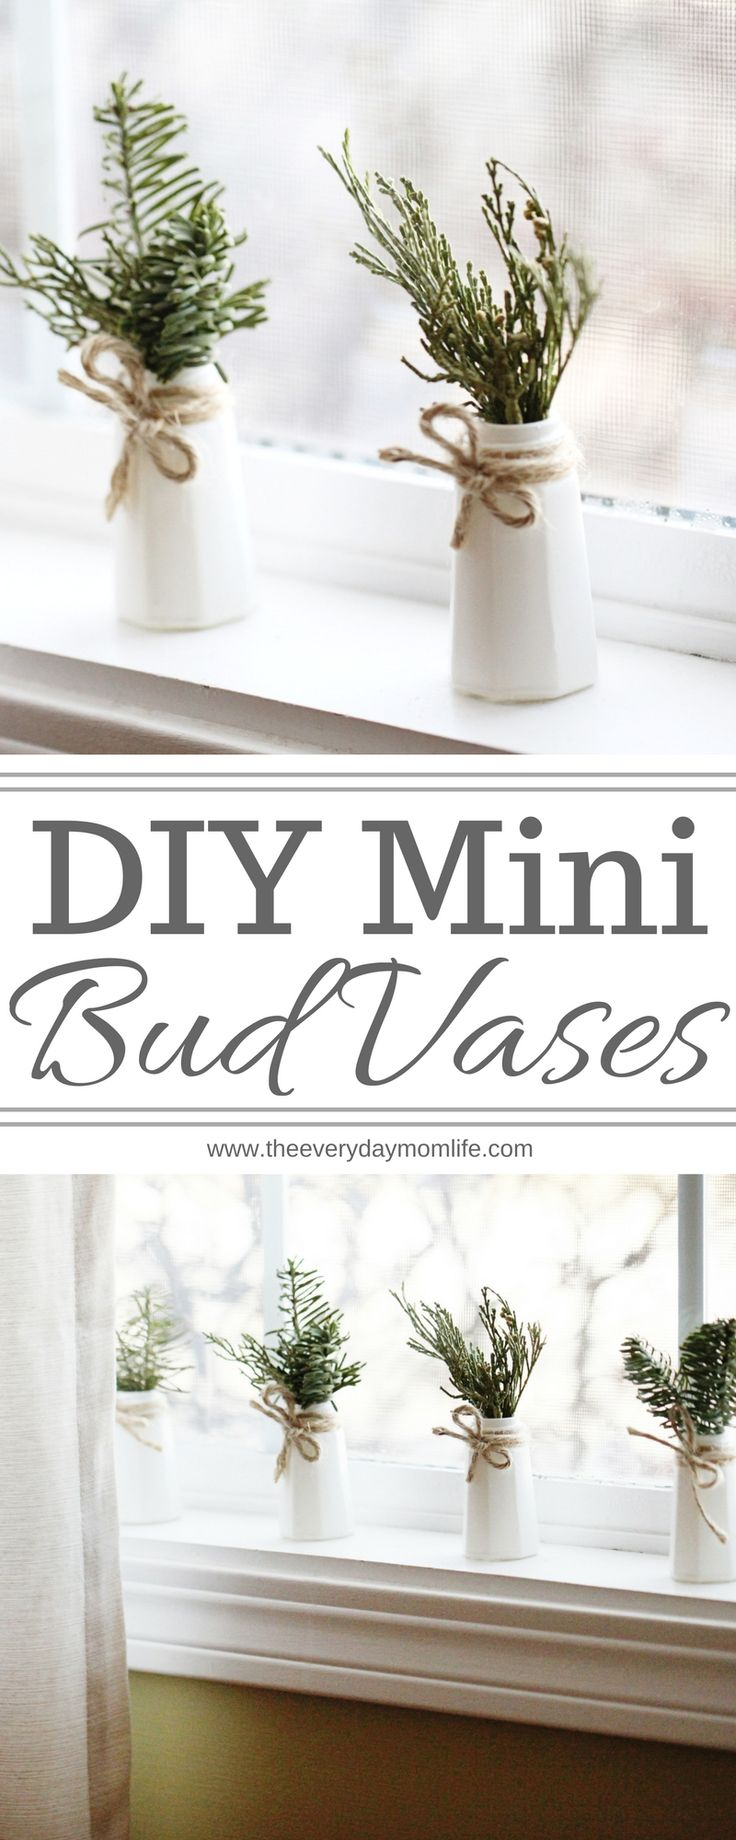 DIY Mini Bud Vases Perfect Year-Round Decor #crafting #crafturday #diy #diyhomedecor #decor #vintagehomedecor